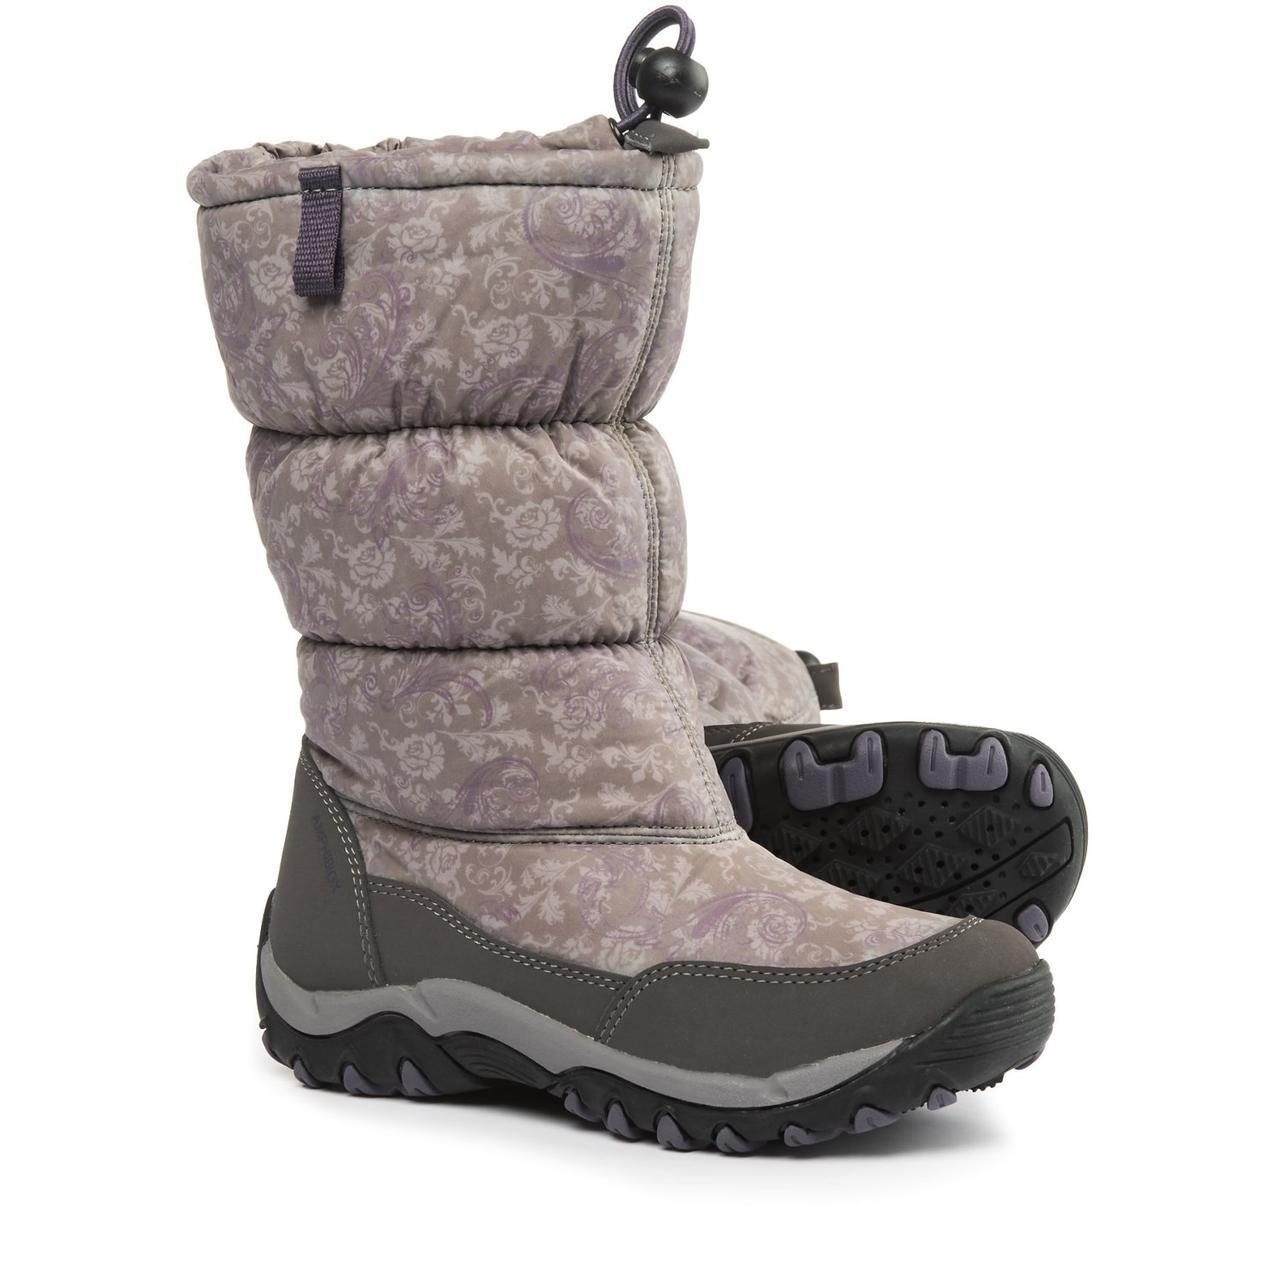 133f43a90 Зимние сапоги Geox Alaska, р-ры 28 и 31 евро, цена 1 400 грн ...